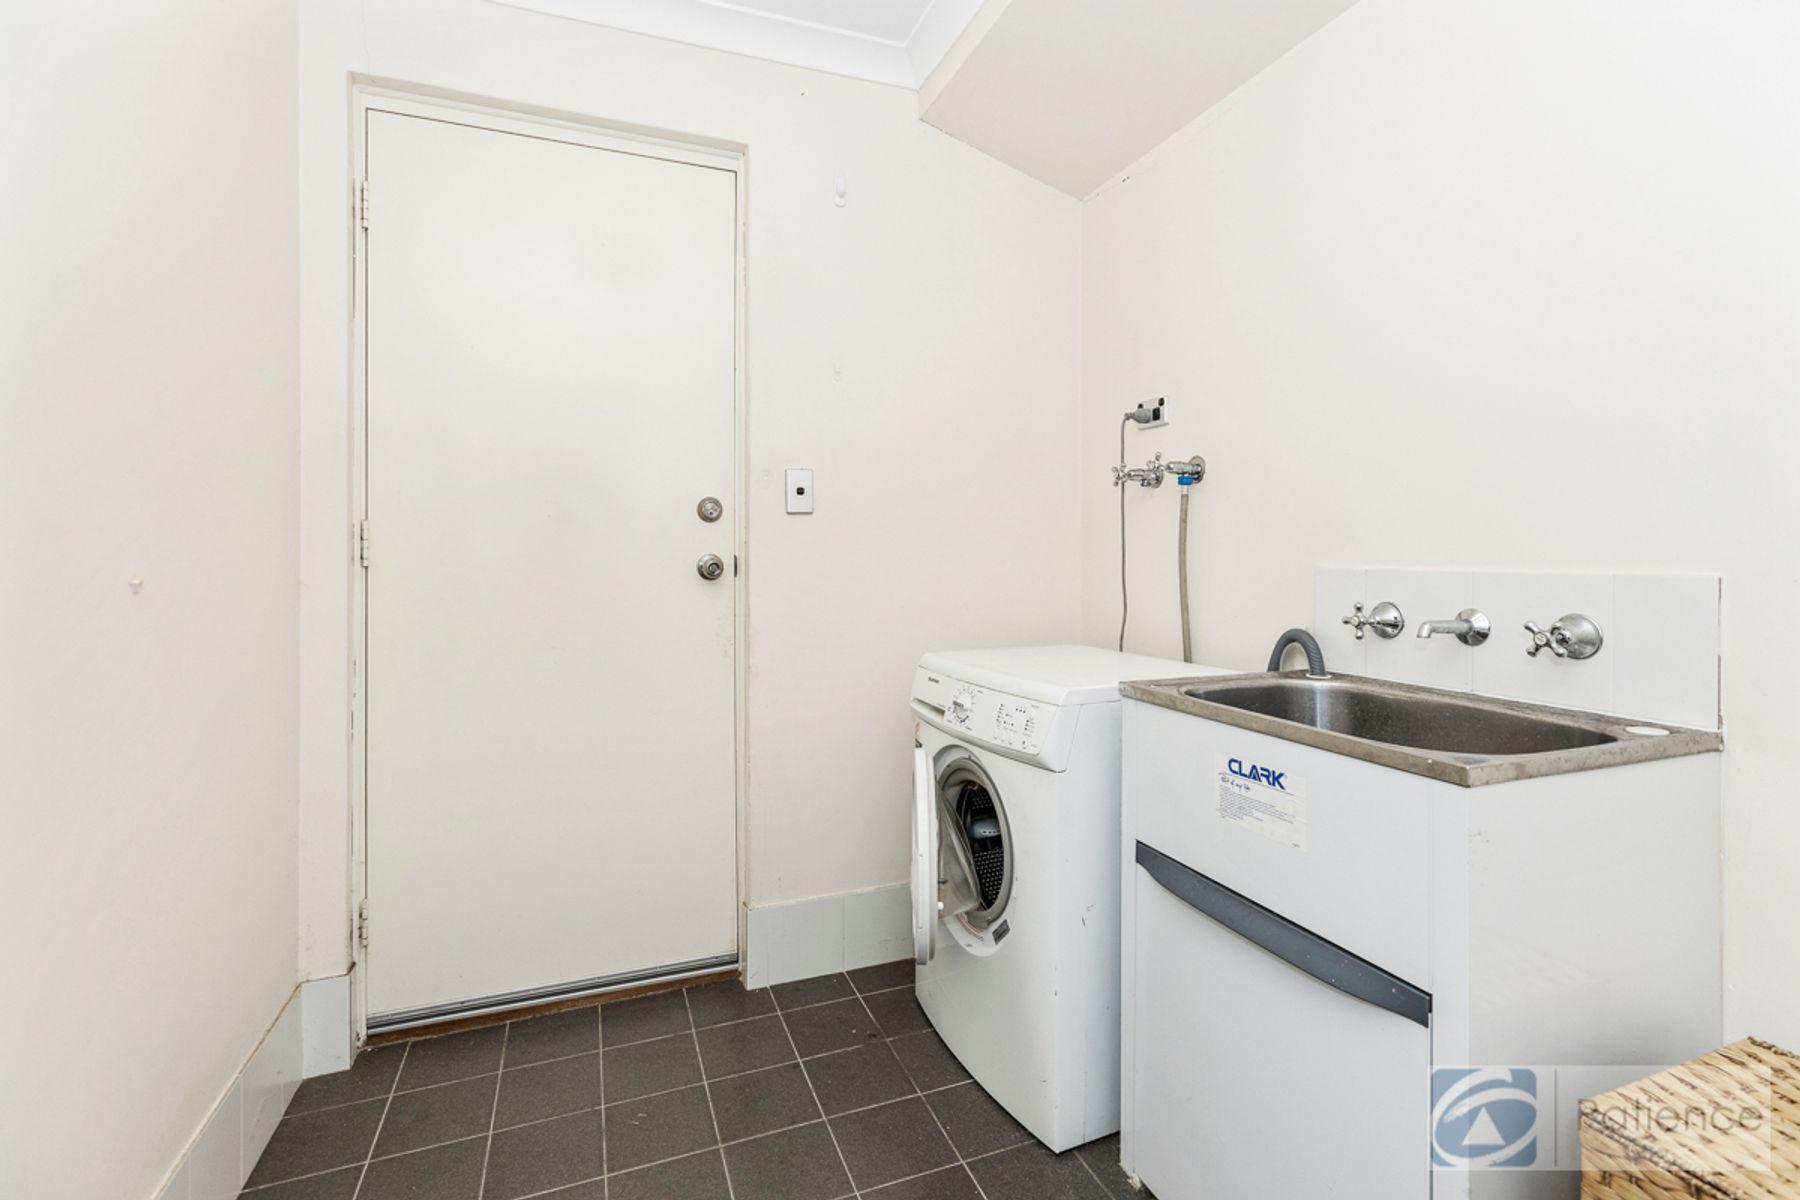 35 Marden Grange, Aveley, WA 6069